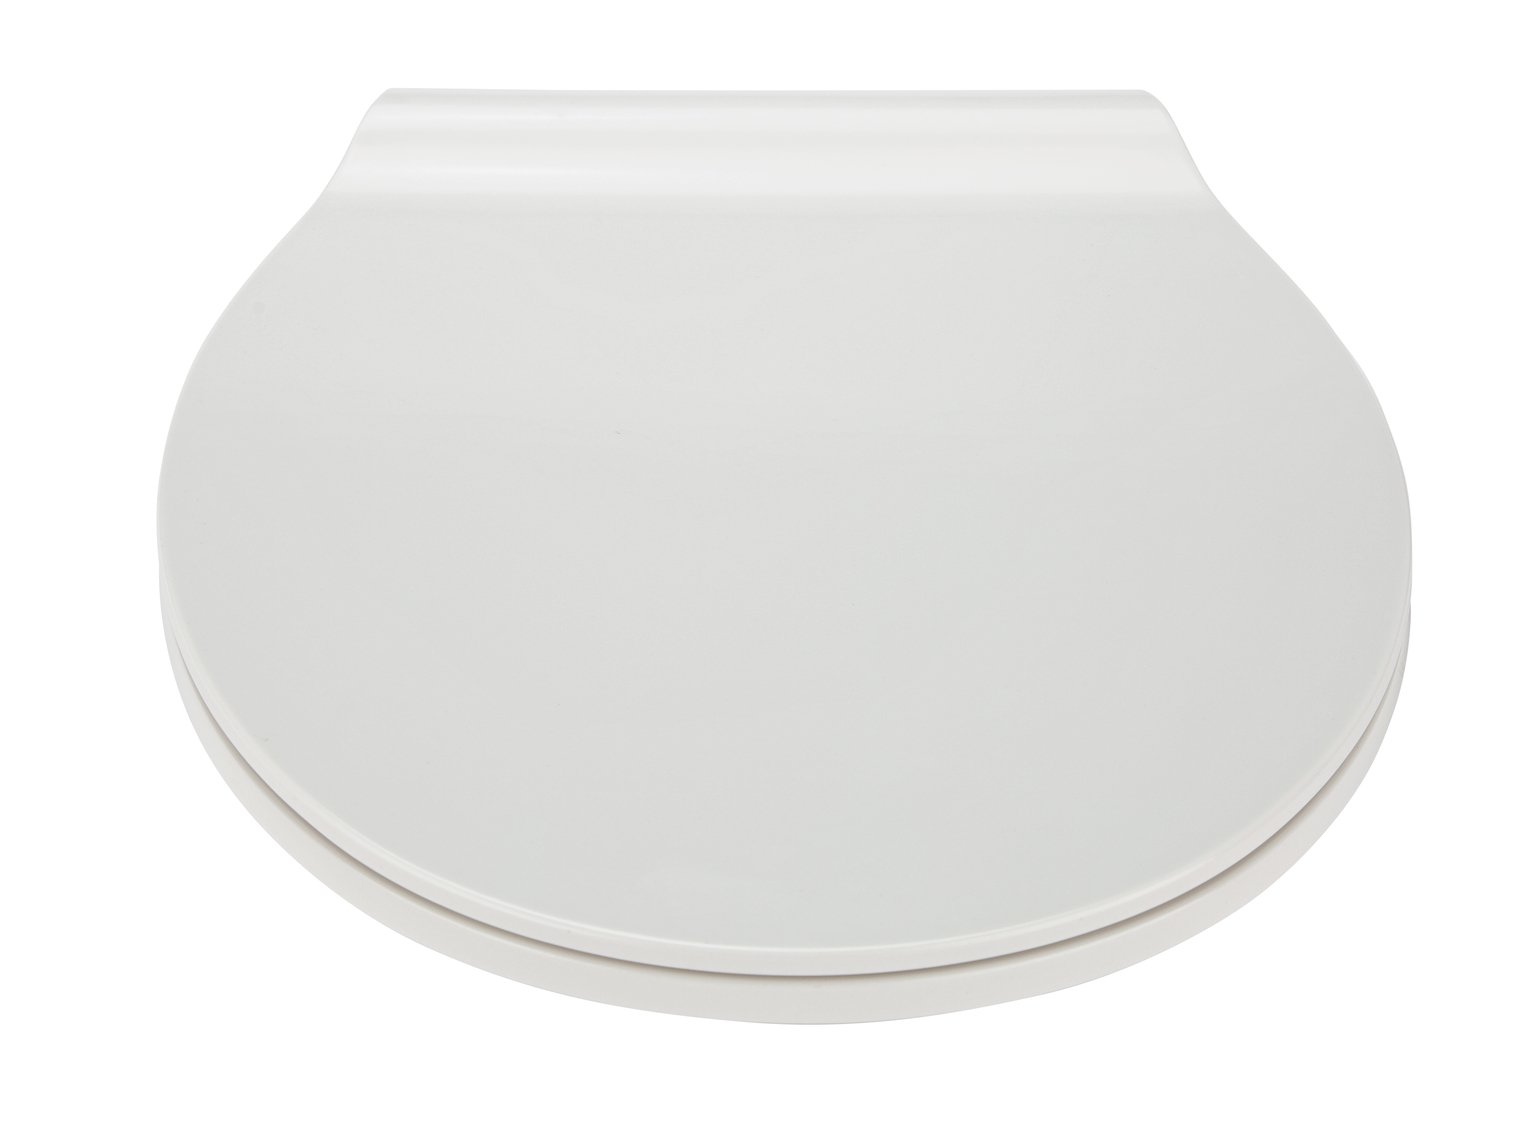 Argos Home Slimline Easy Clean Toilet Seat